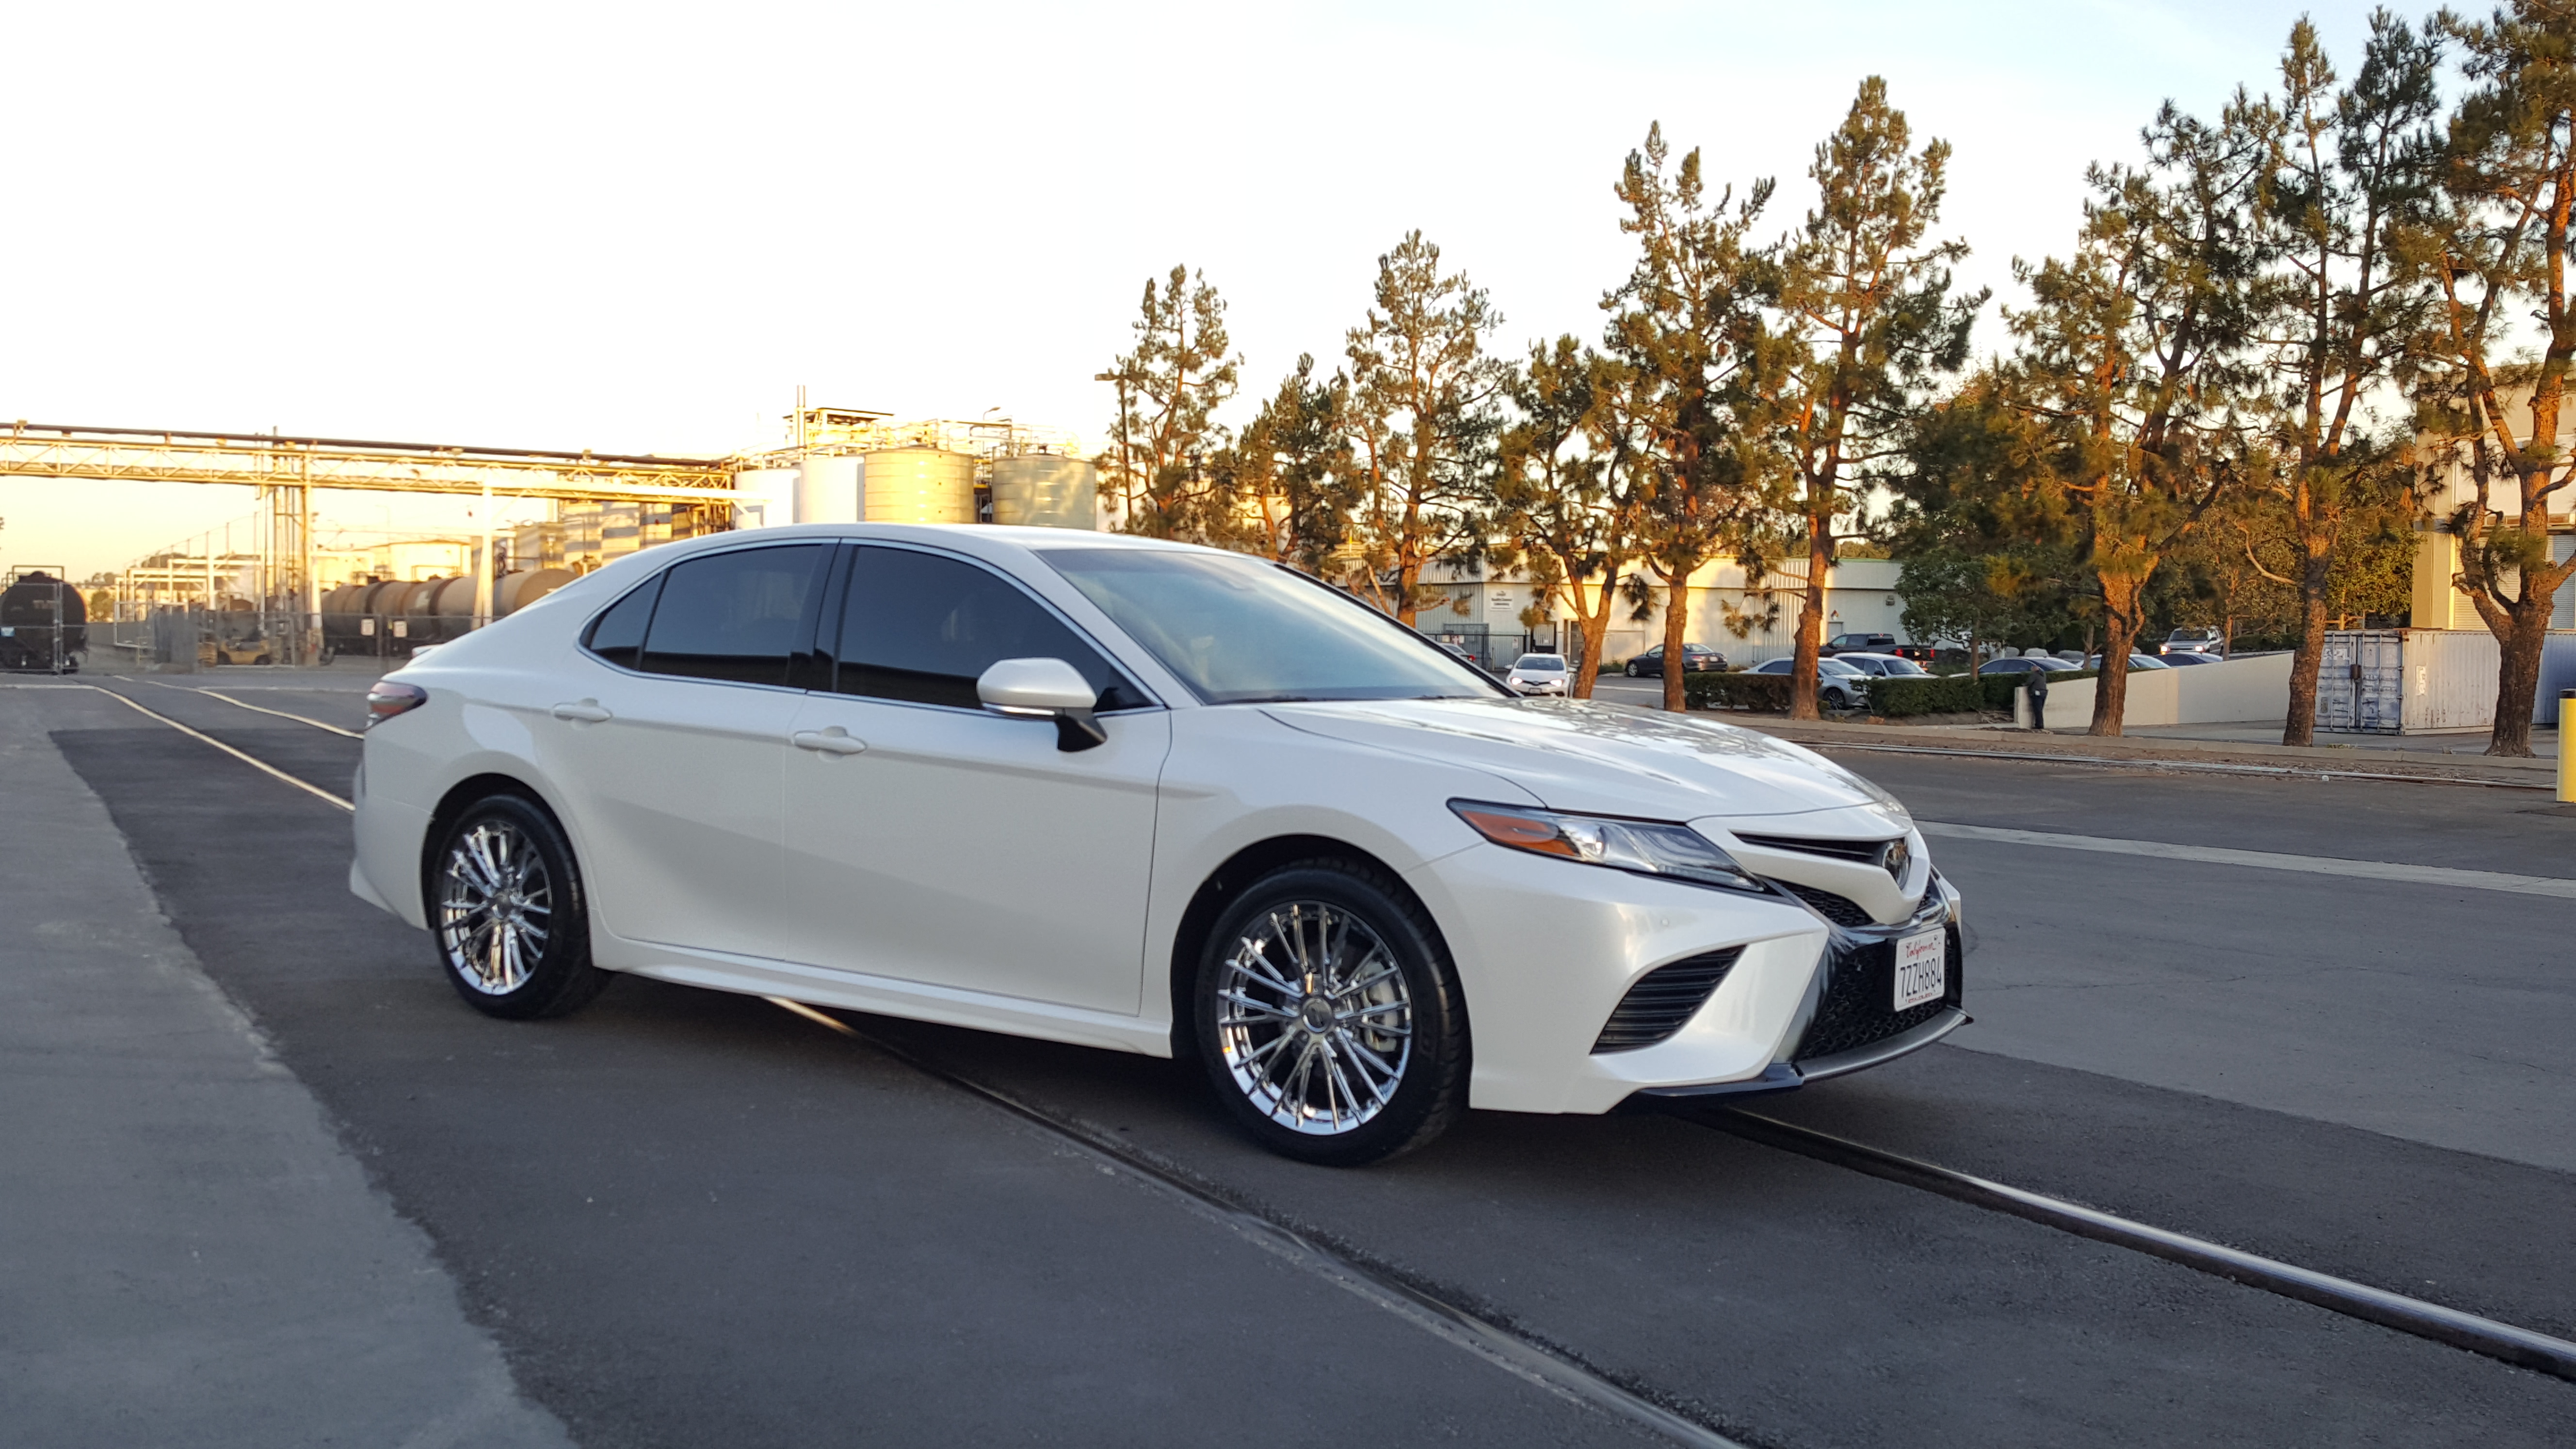 Toyota Costa Mesa >> Gallery - SoCal Custom Wheels